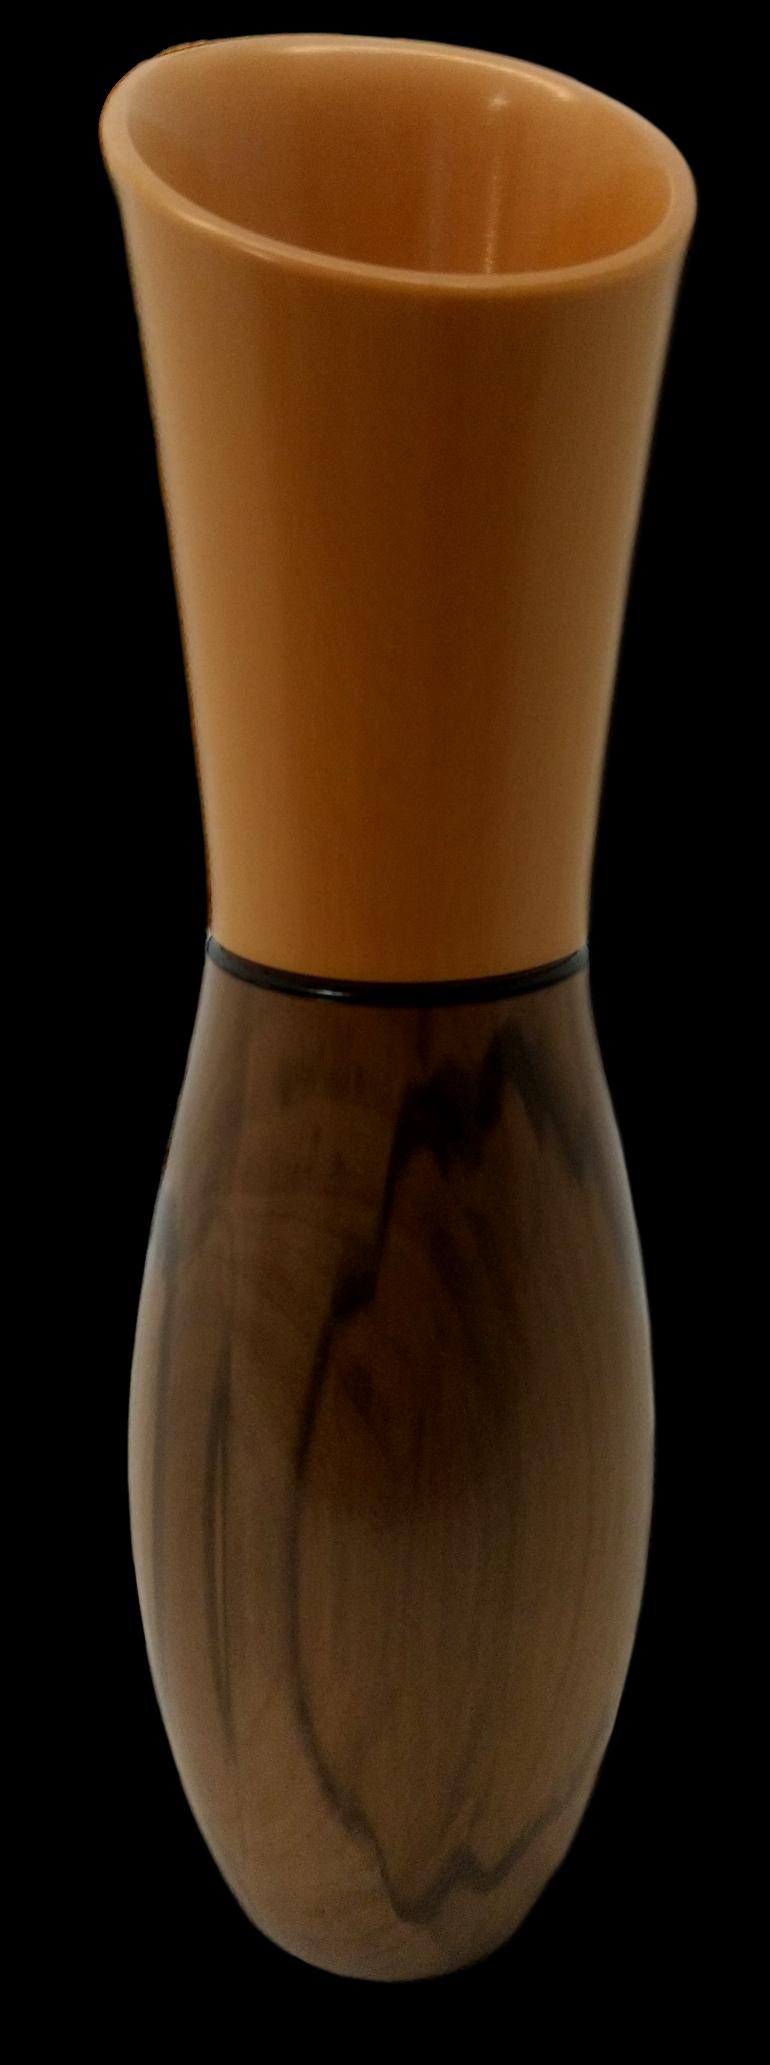 Tulip salt or pepper spice grinders